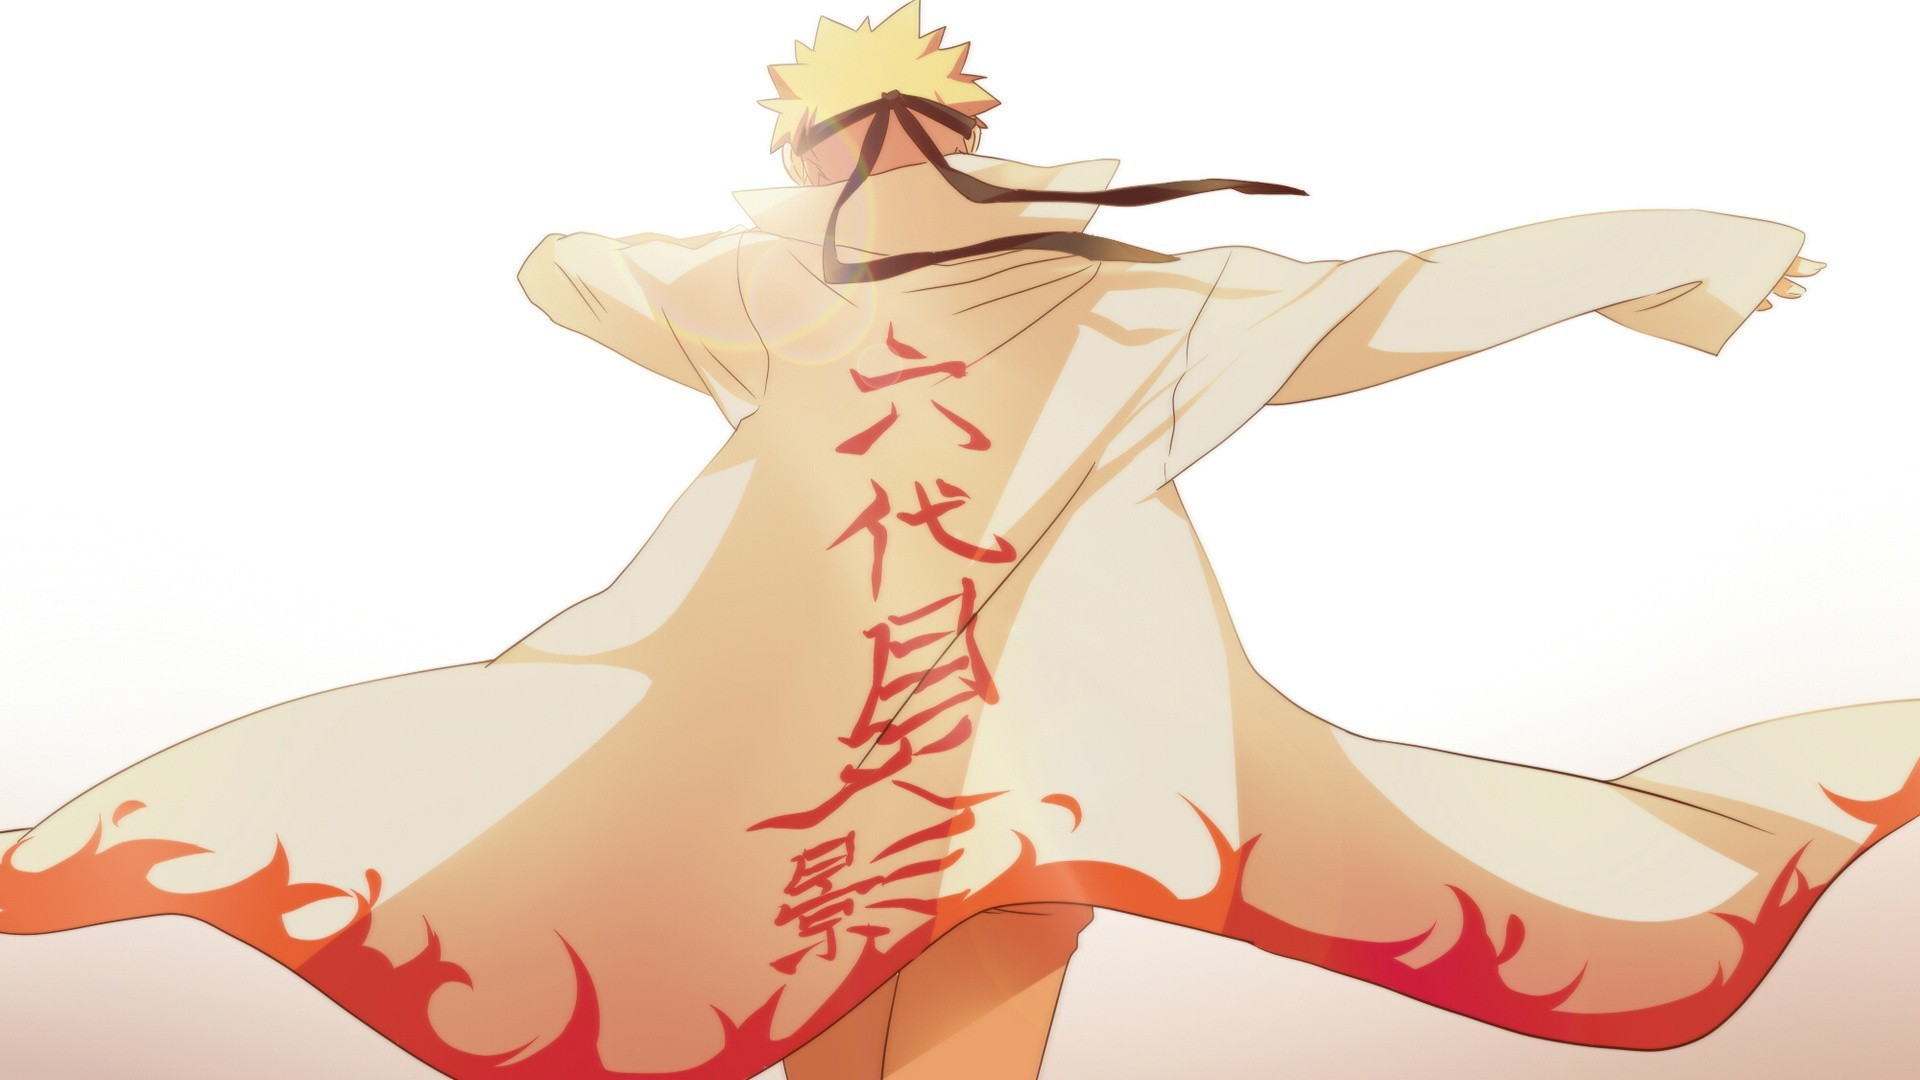 1280×800 (100%)   Naruto & Dad   Pinterest   Naruto, Naruto wallpaper and  Anime